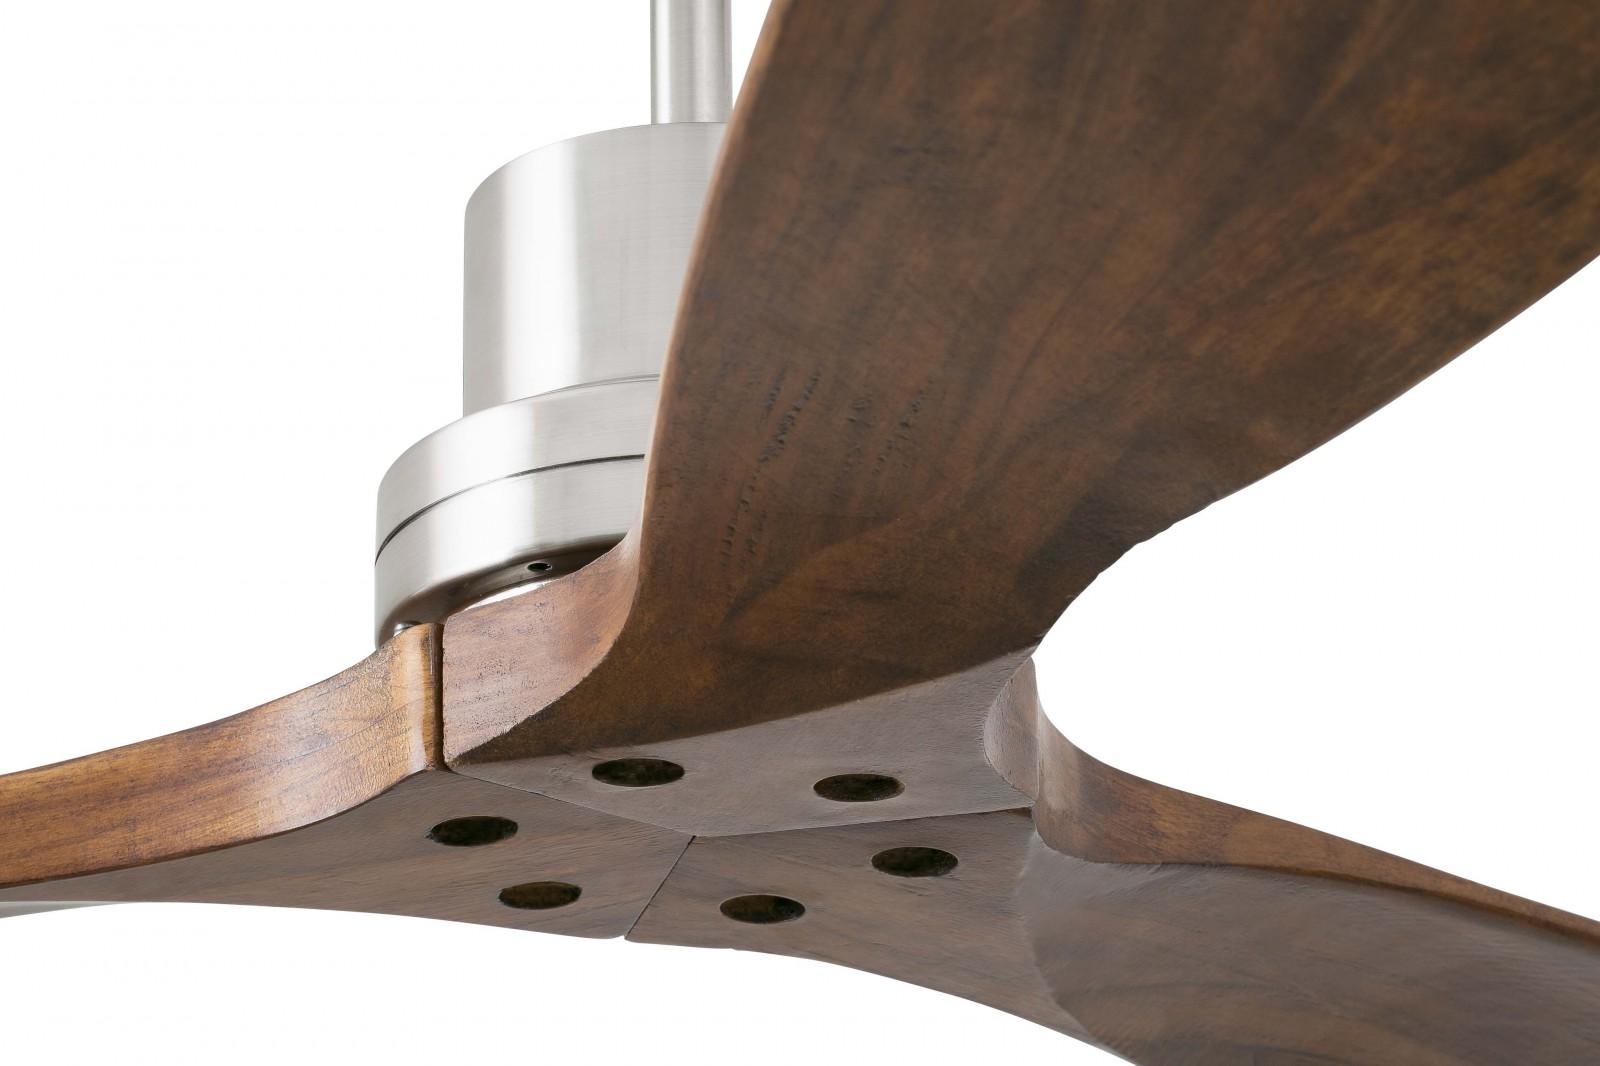 deckenventilator lantau matt nickel 132 cm mit. Black Bedroom Furniture Sets. Home Design Ideas